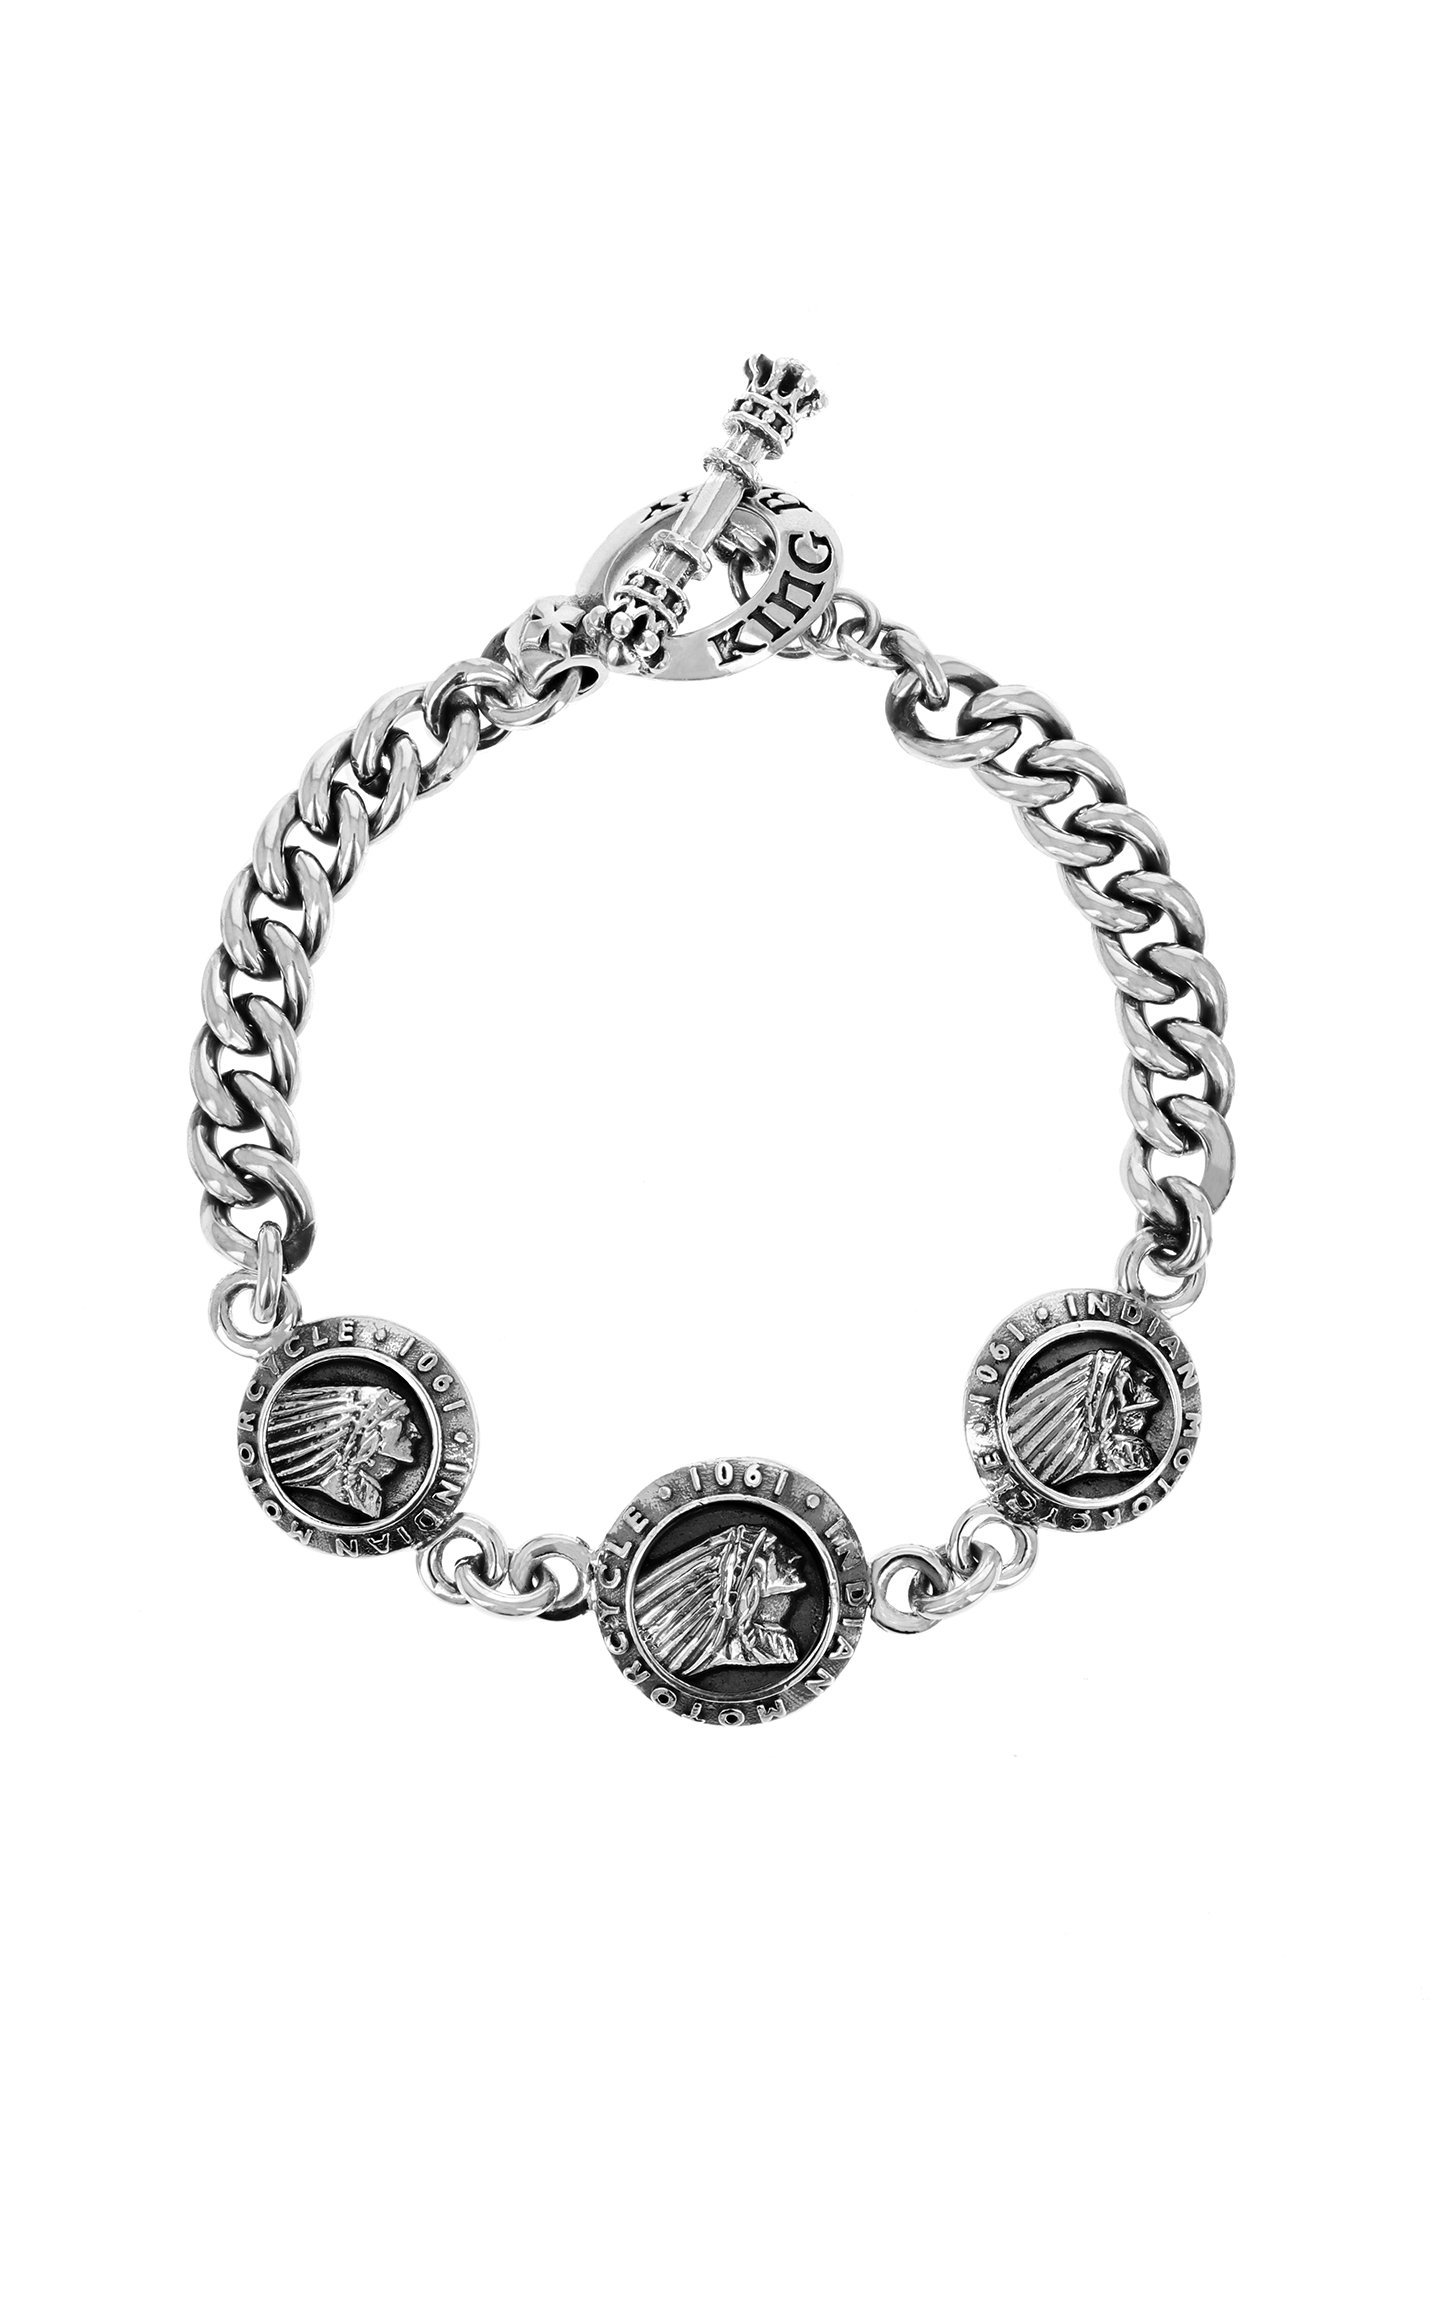 Indian Motorcycle Charm Bracelet